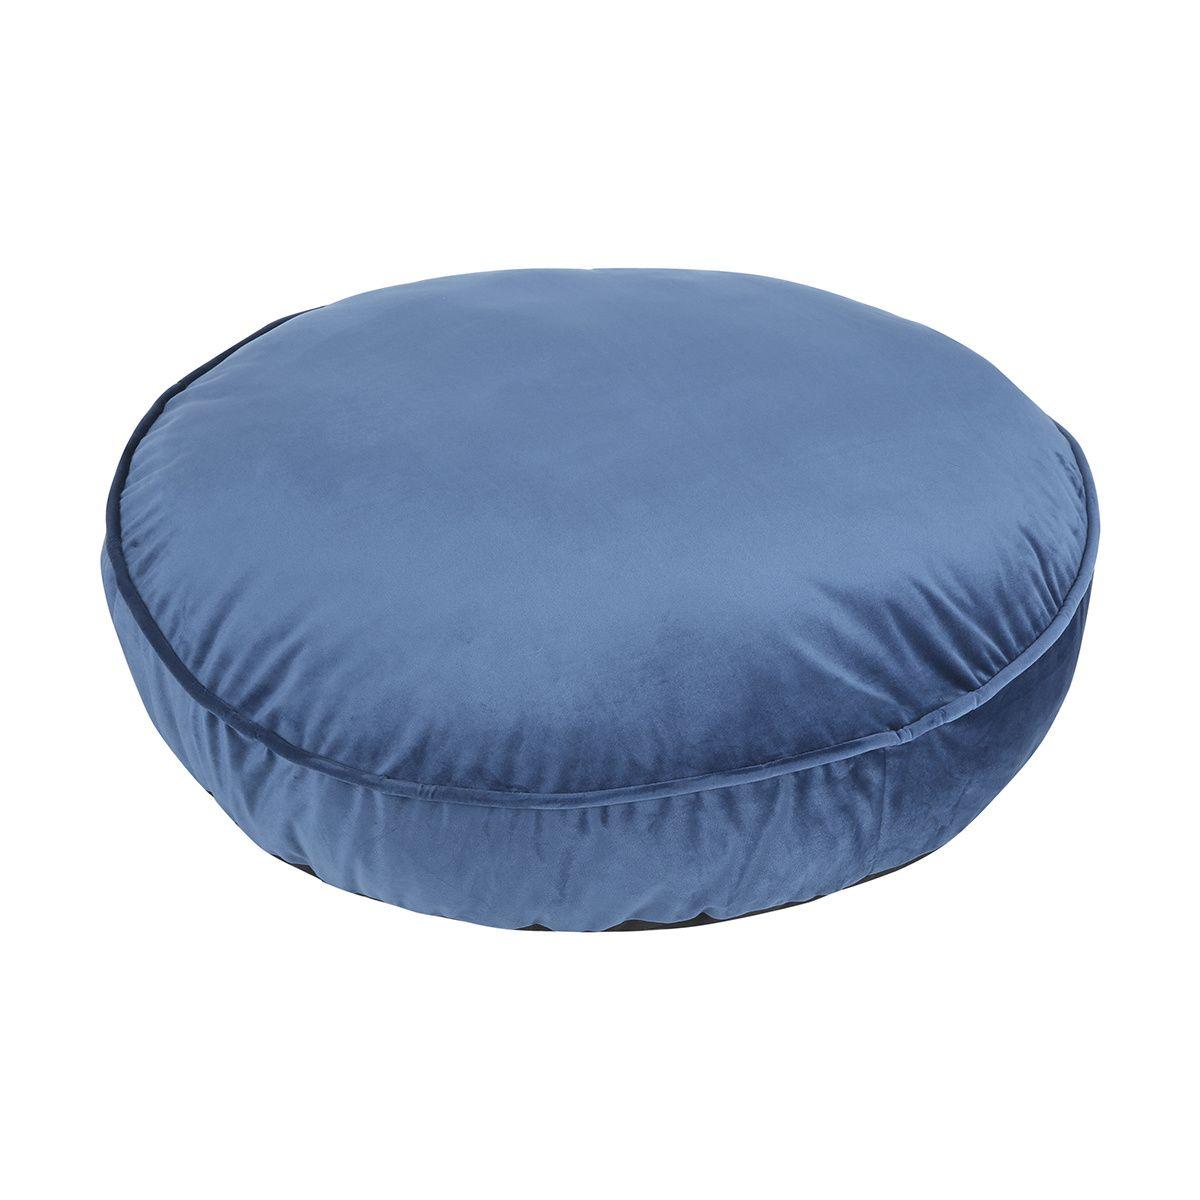 Remarkable Velvet Look Round Pet Bed Kmart Bean Bag Chair Home Ibusinesslaw Wood Chair Design Ideas Ibusinesslaworg